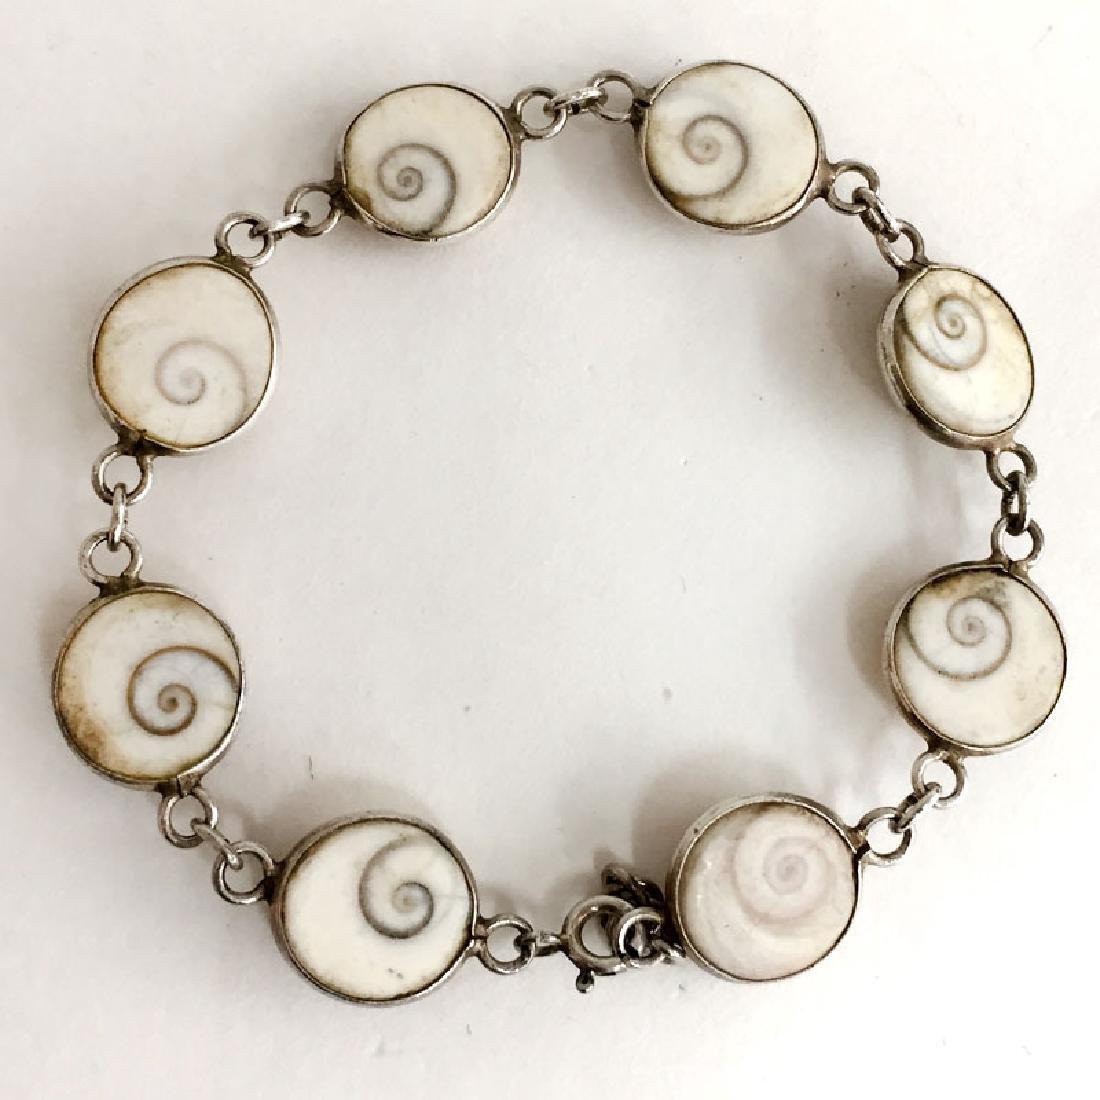 Vintage sterling silver shell links flexible bracelet - 5